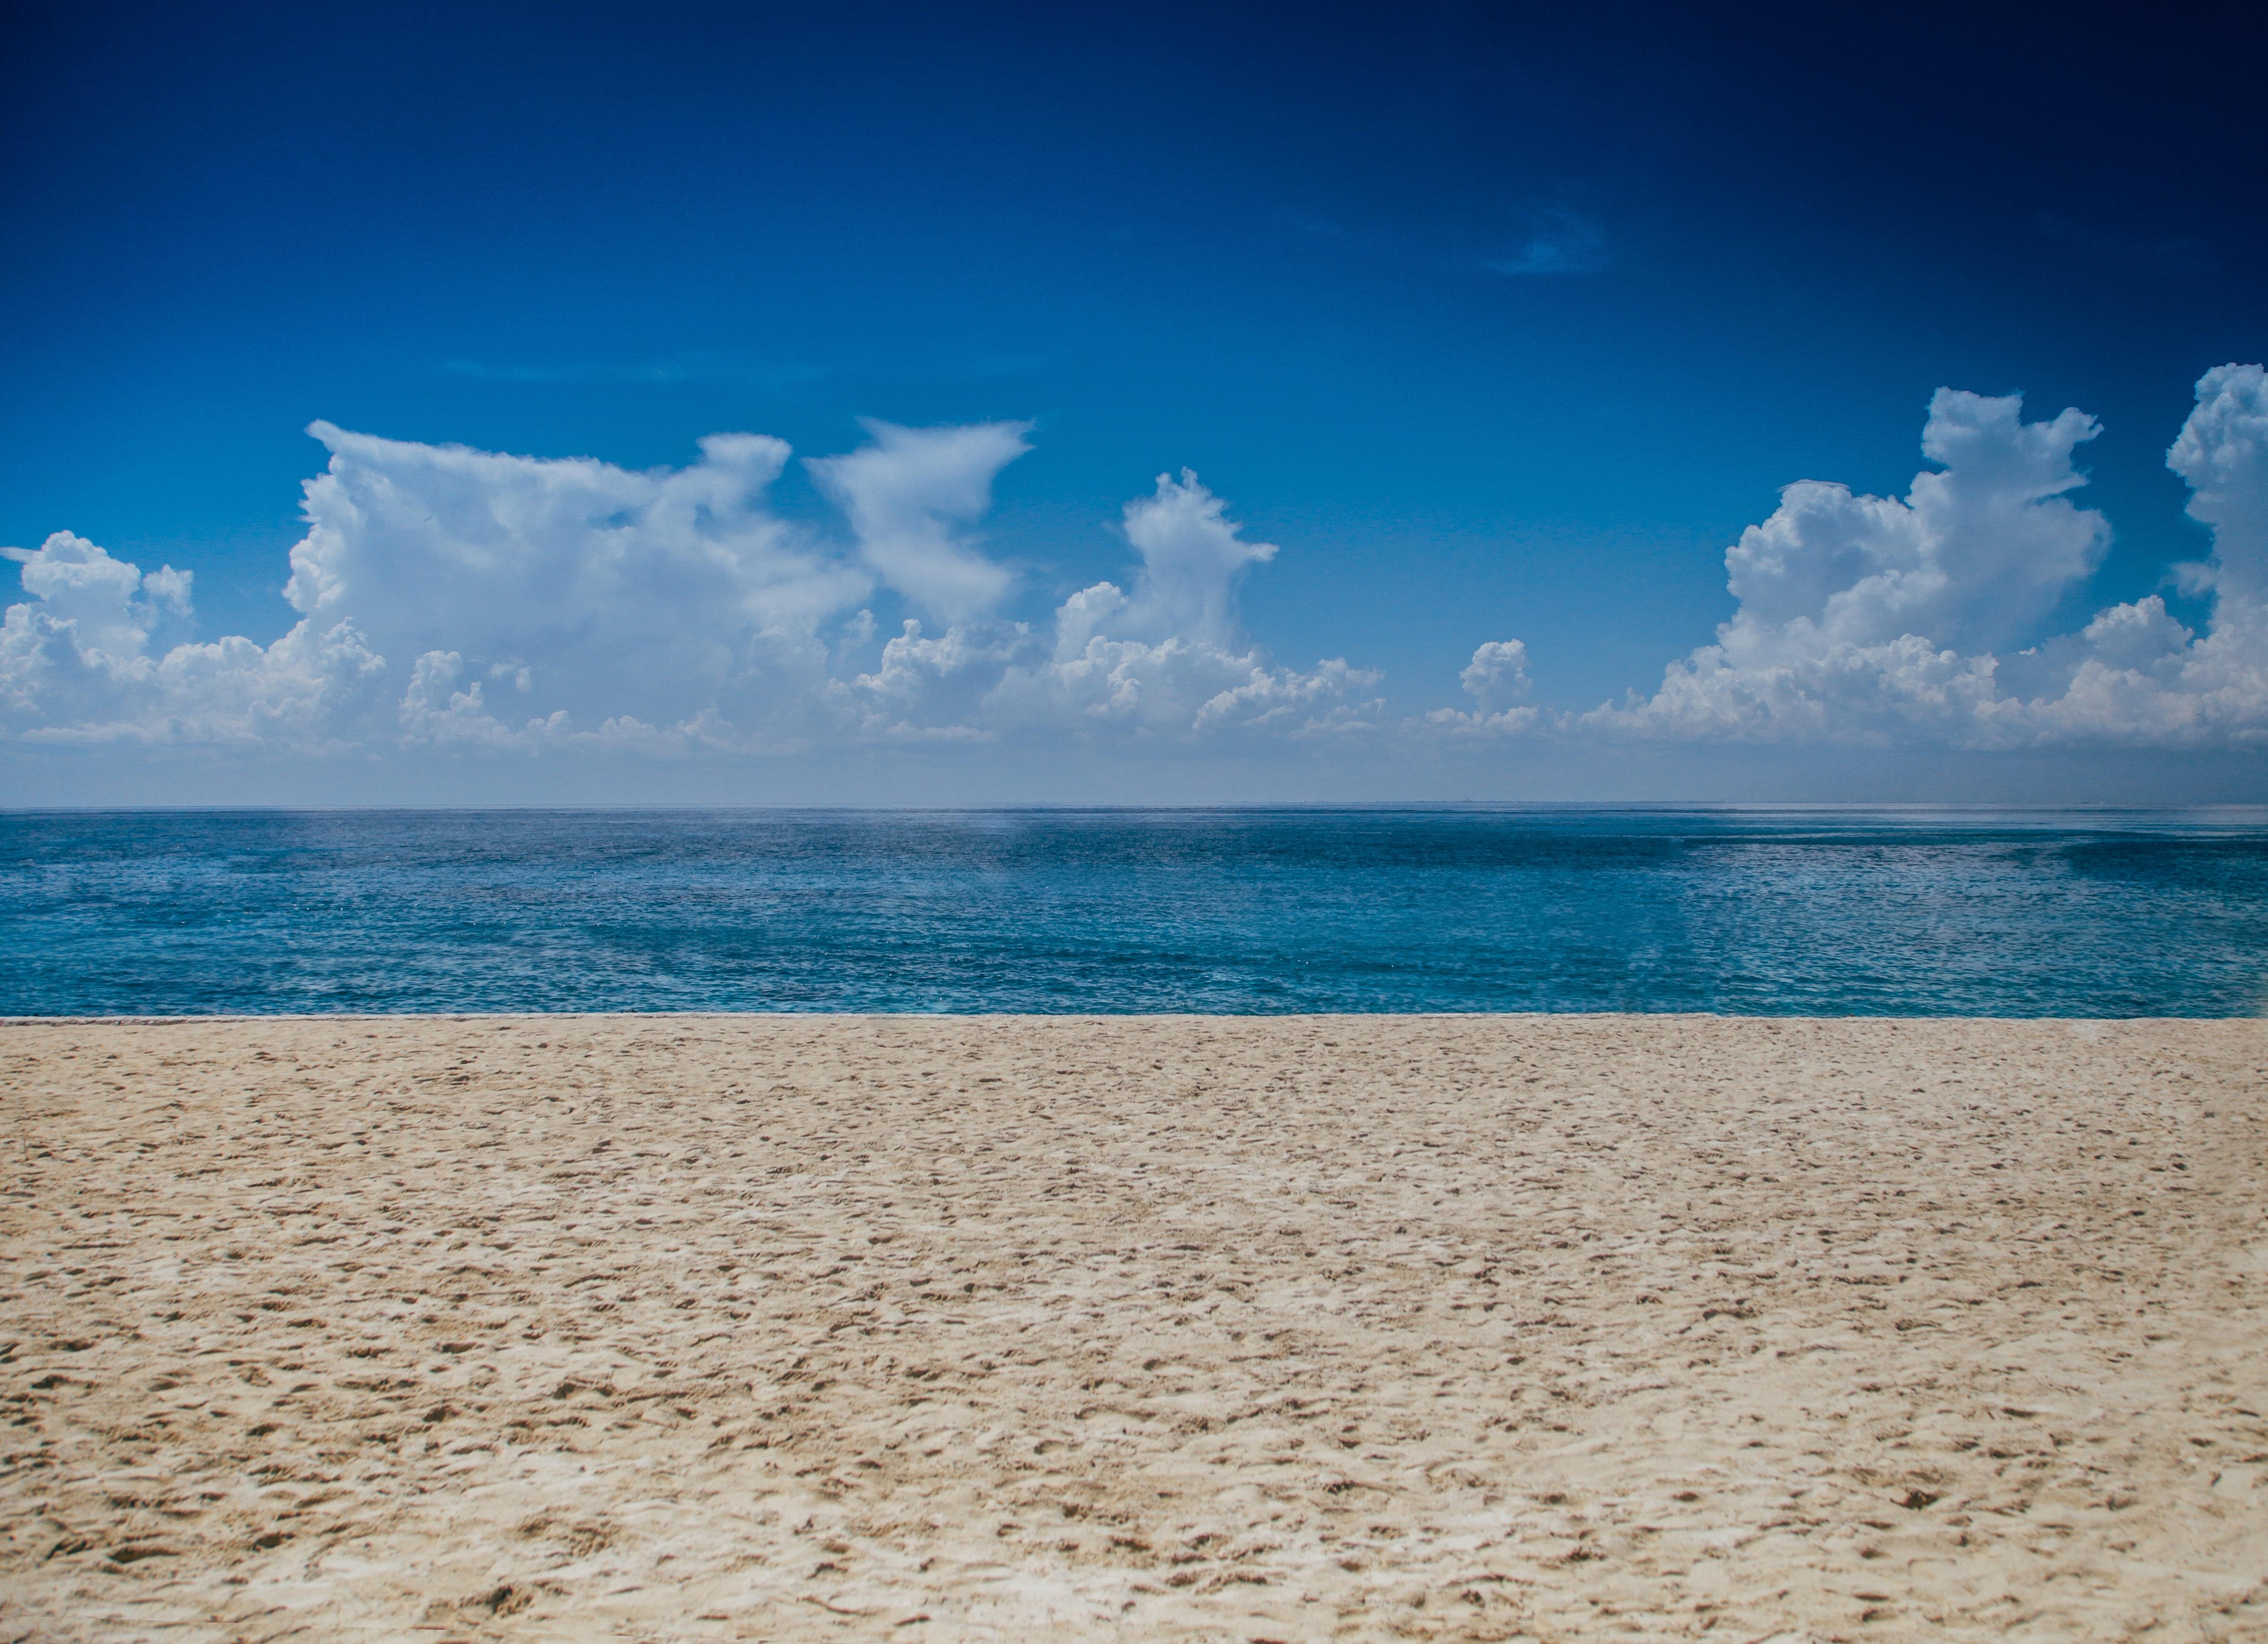 природа море горизонт небо облака пляж берег отдых nature sea horizon the sky clouds beach shore rest  № 821535 бесплатно